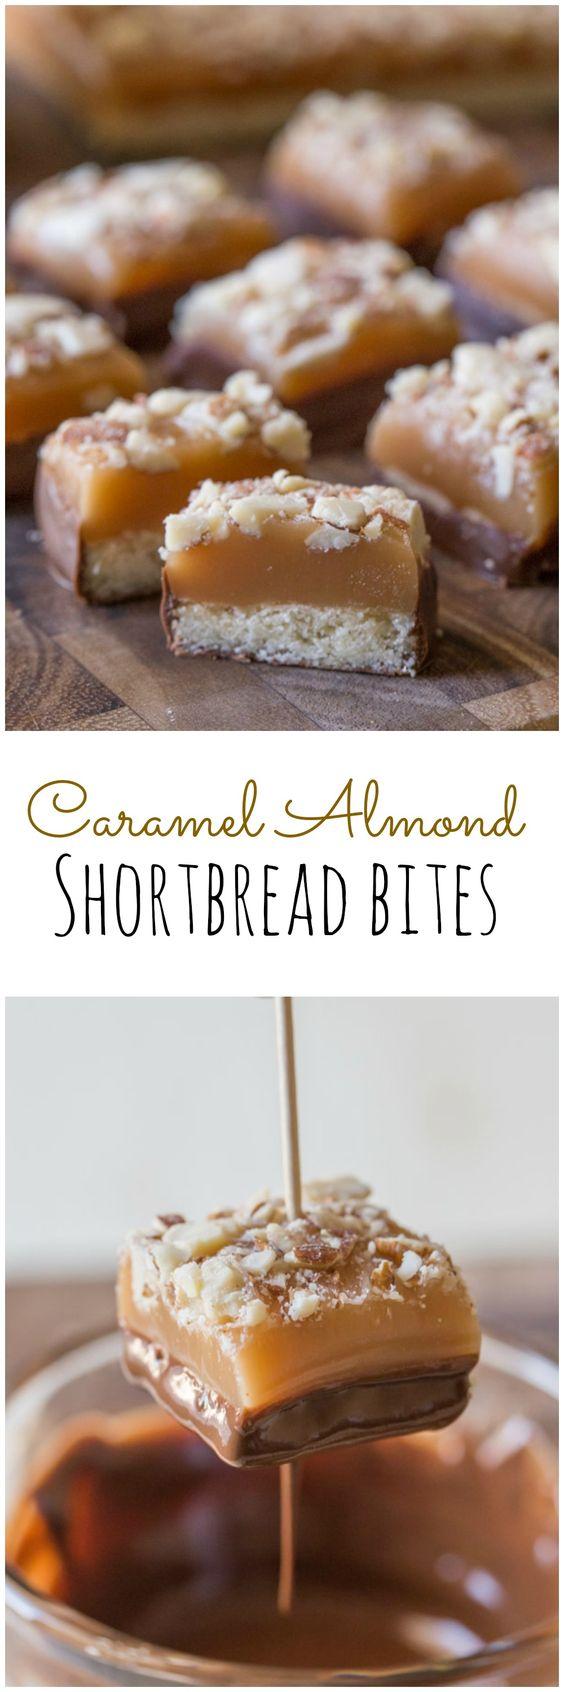 Homemade Almond Caramel Shortbread Bites | Recipe ...